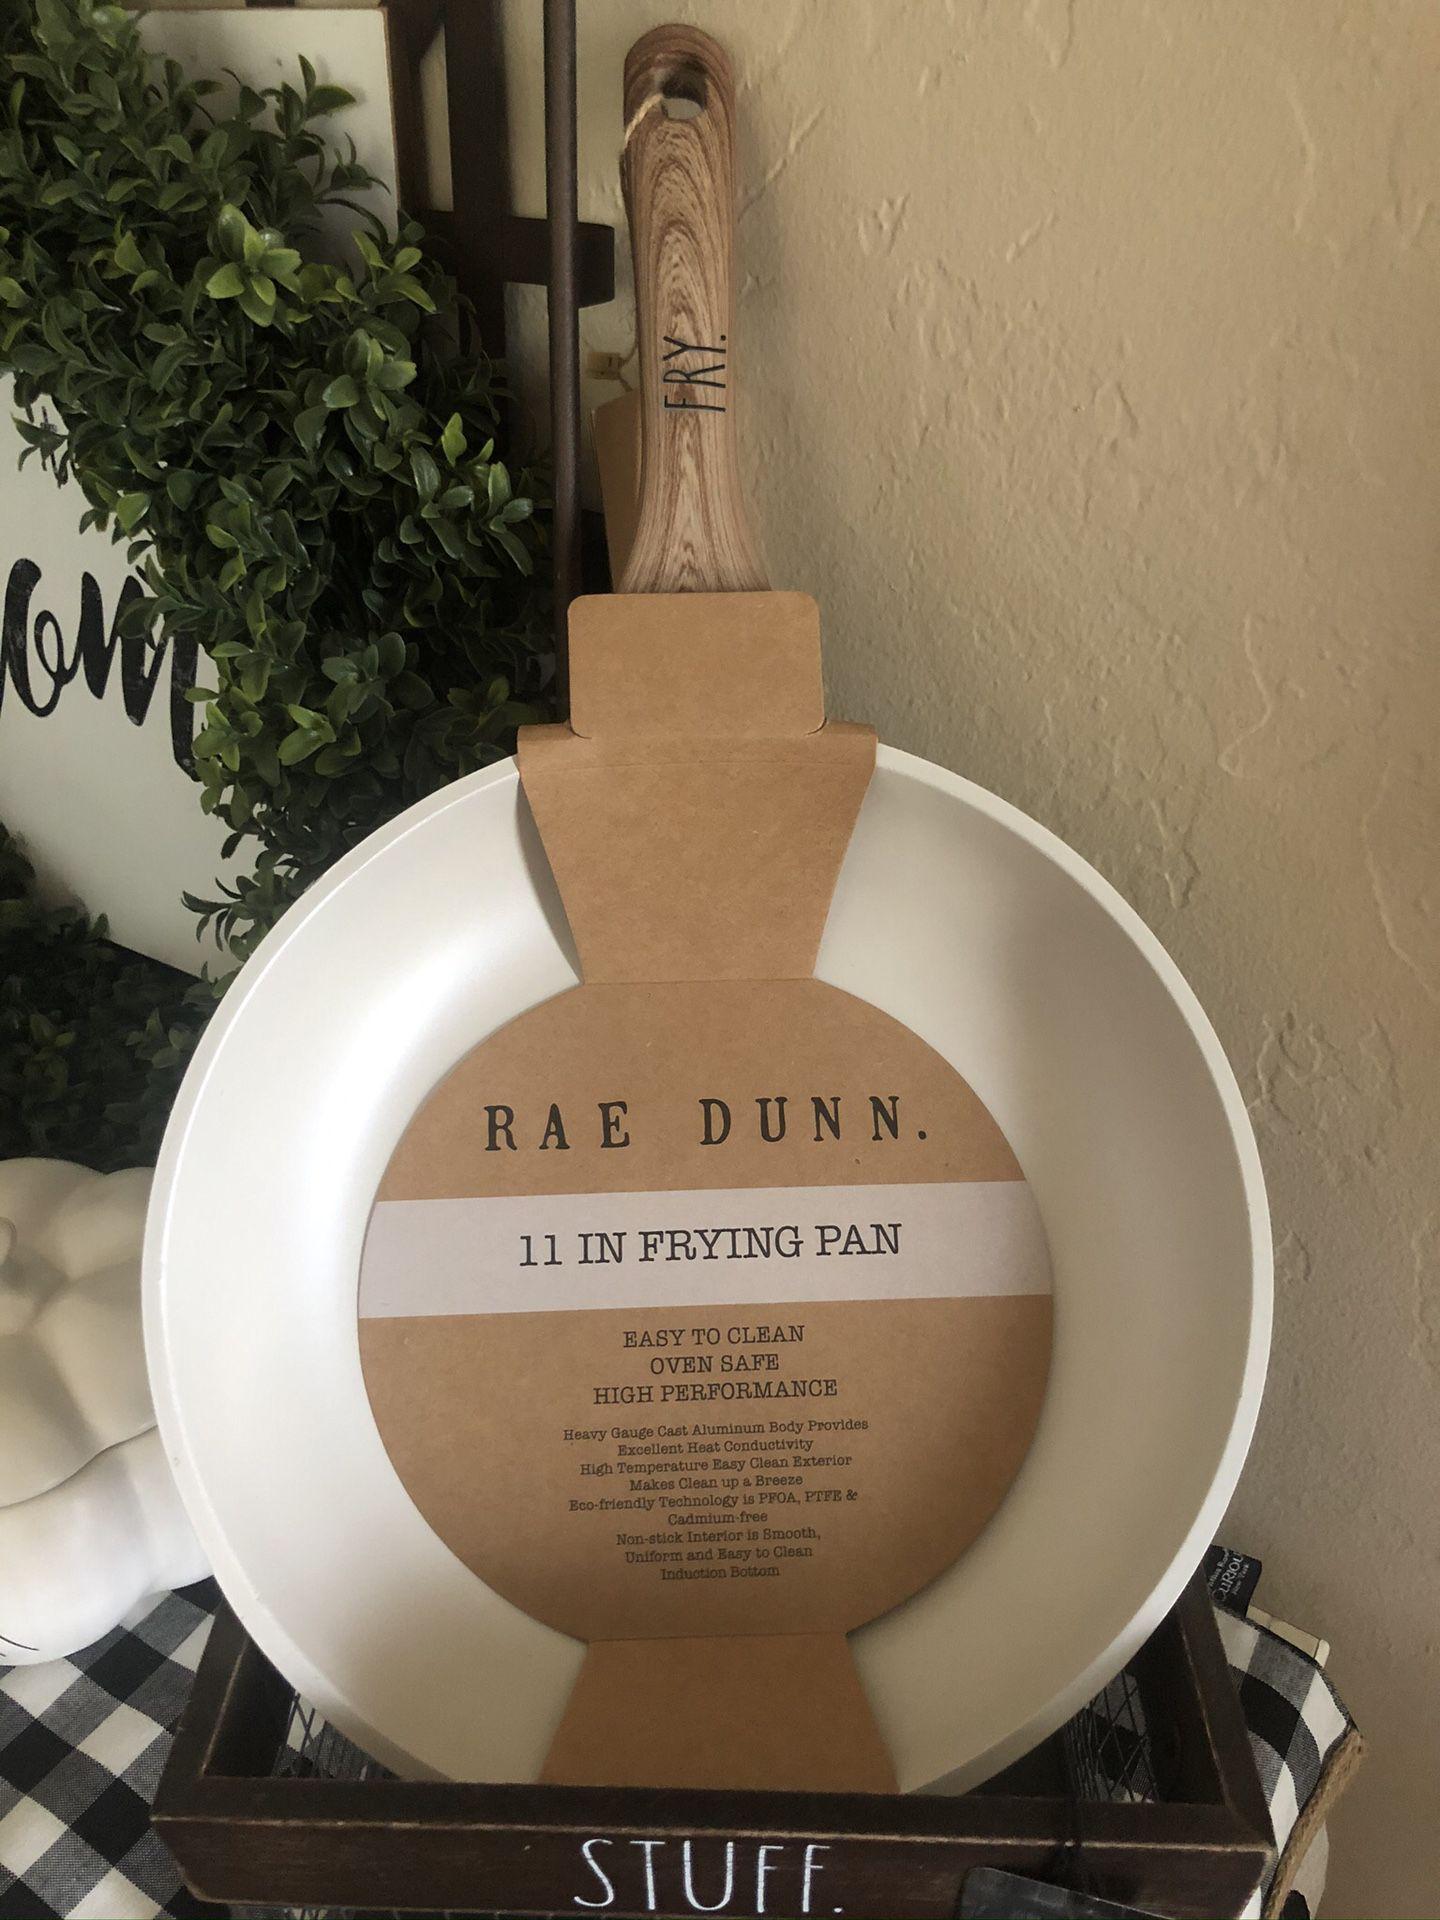 New Rae Dunn White FRY 11in Frying Pan